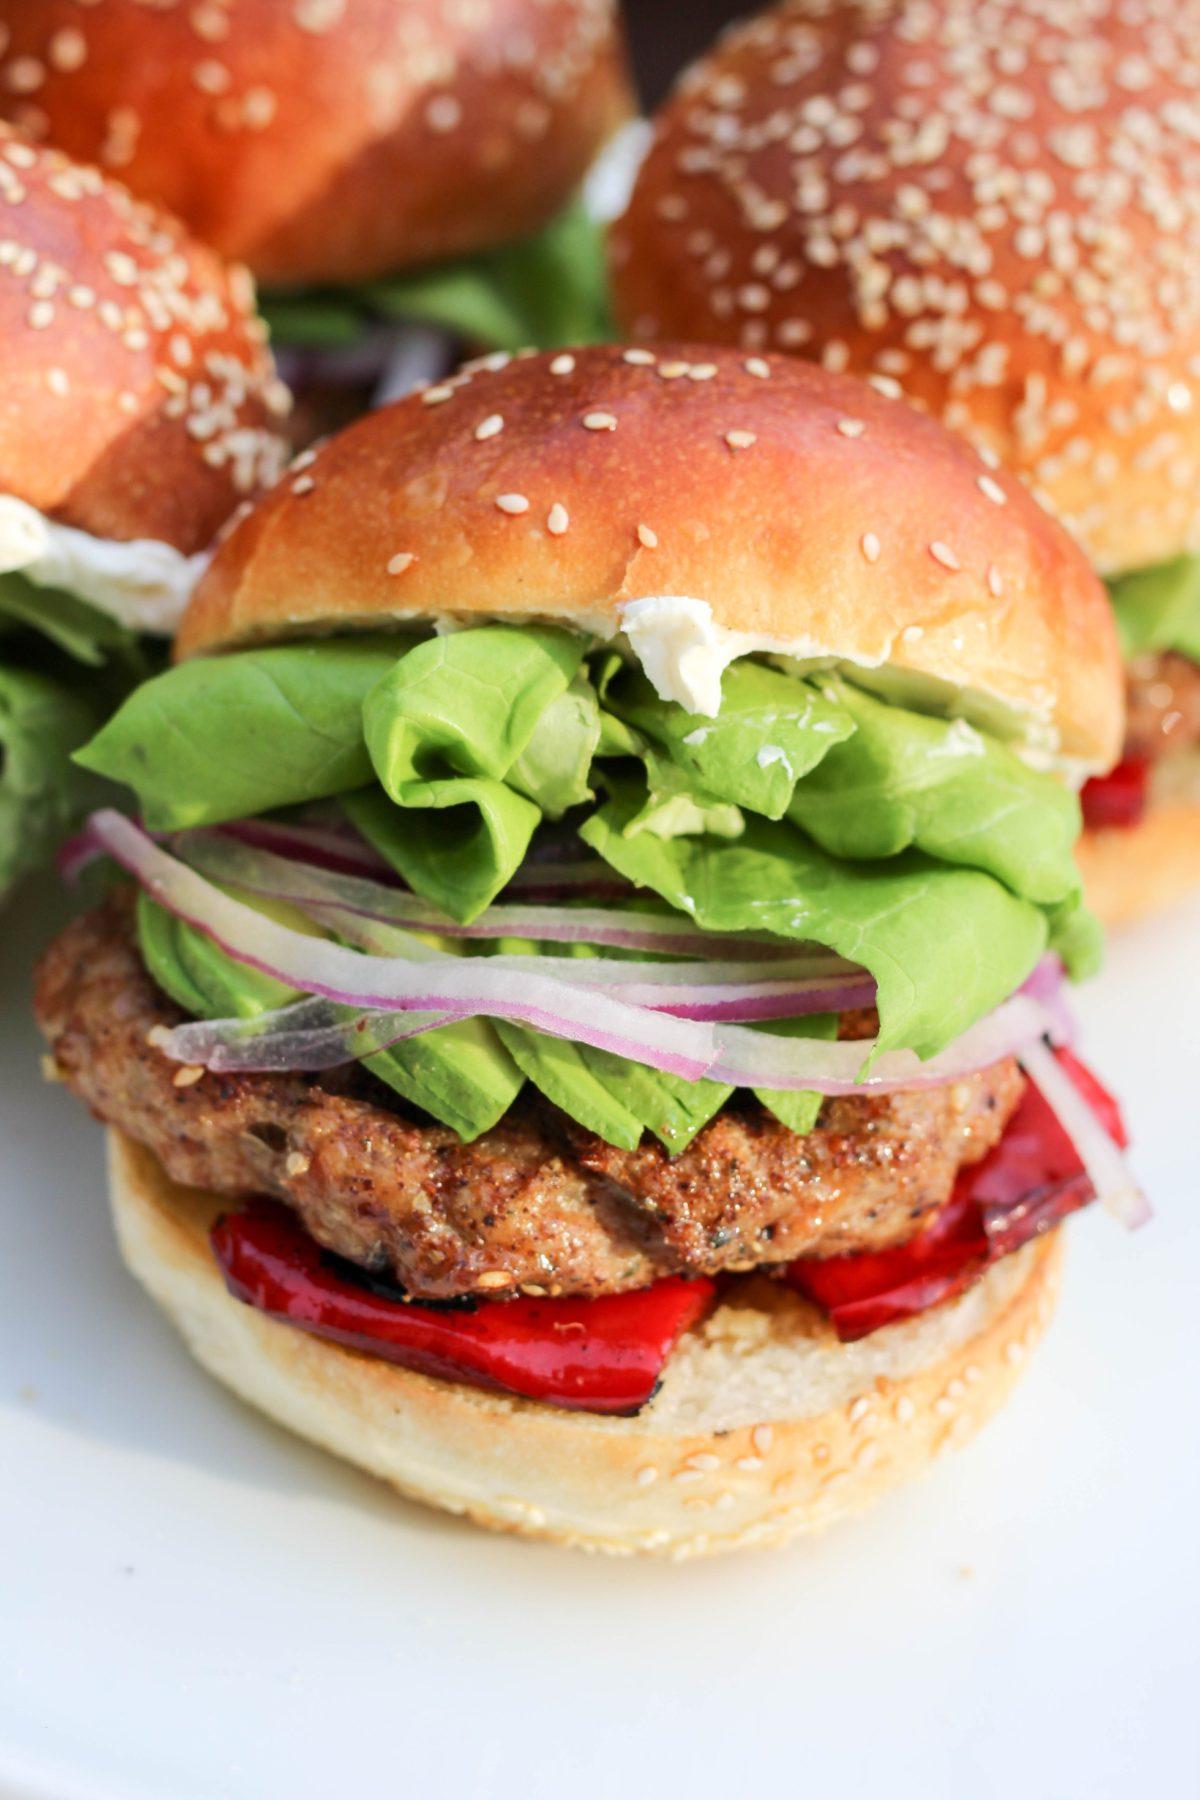 za-ha zaatar recipe idea chicken burgers